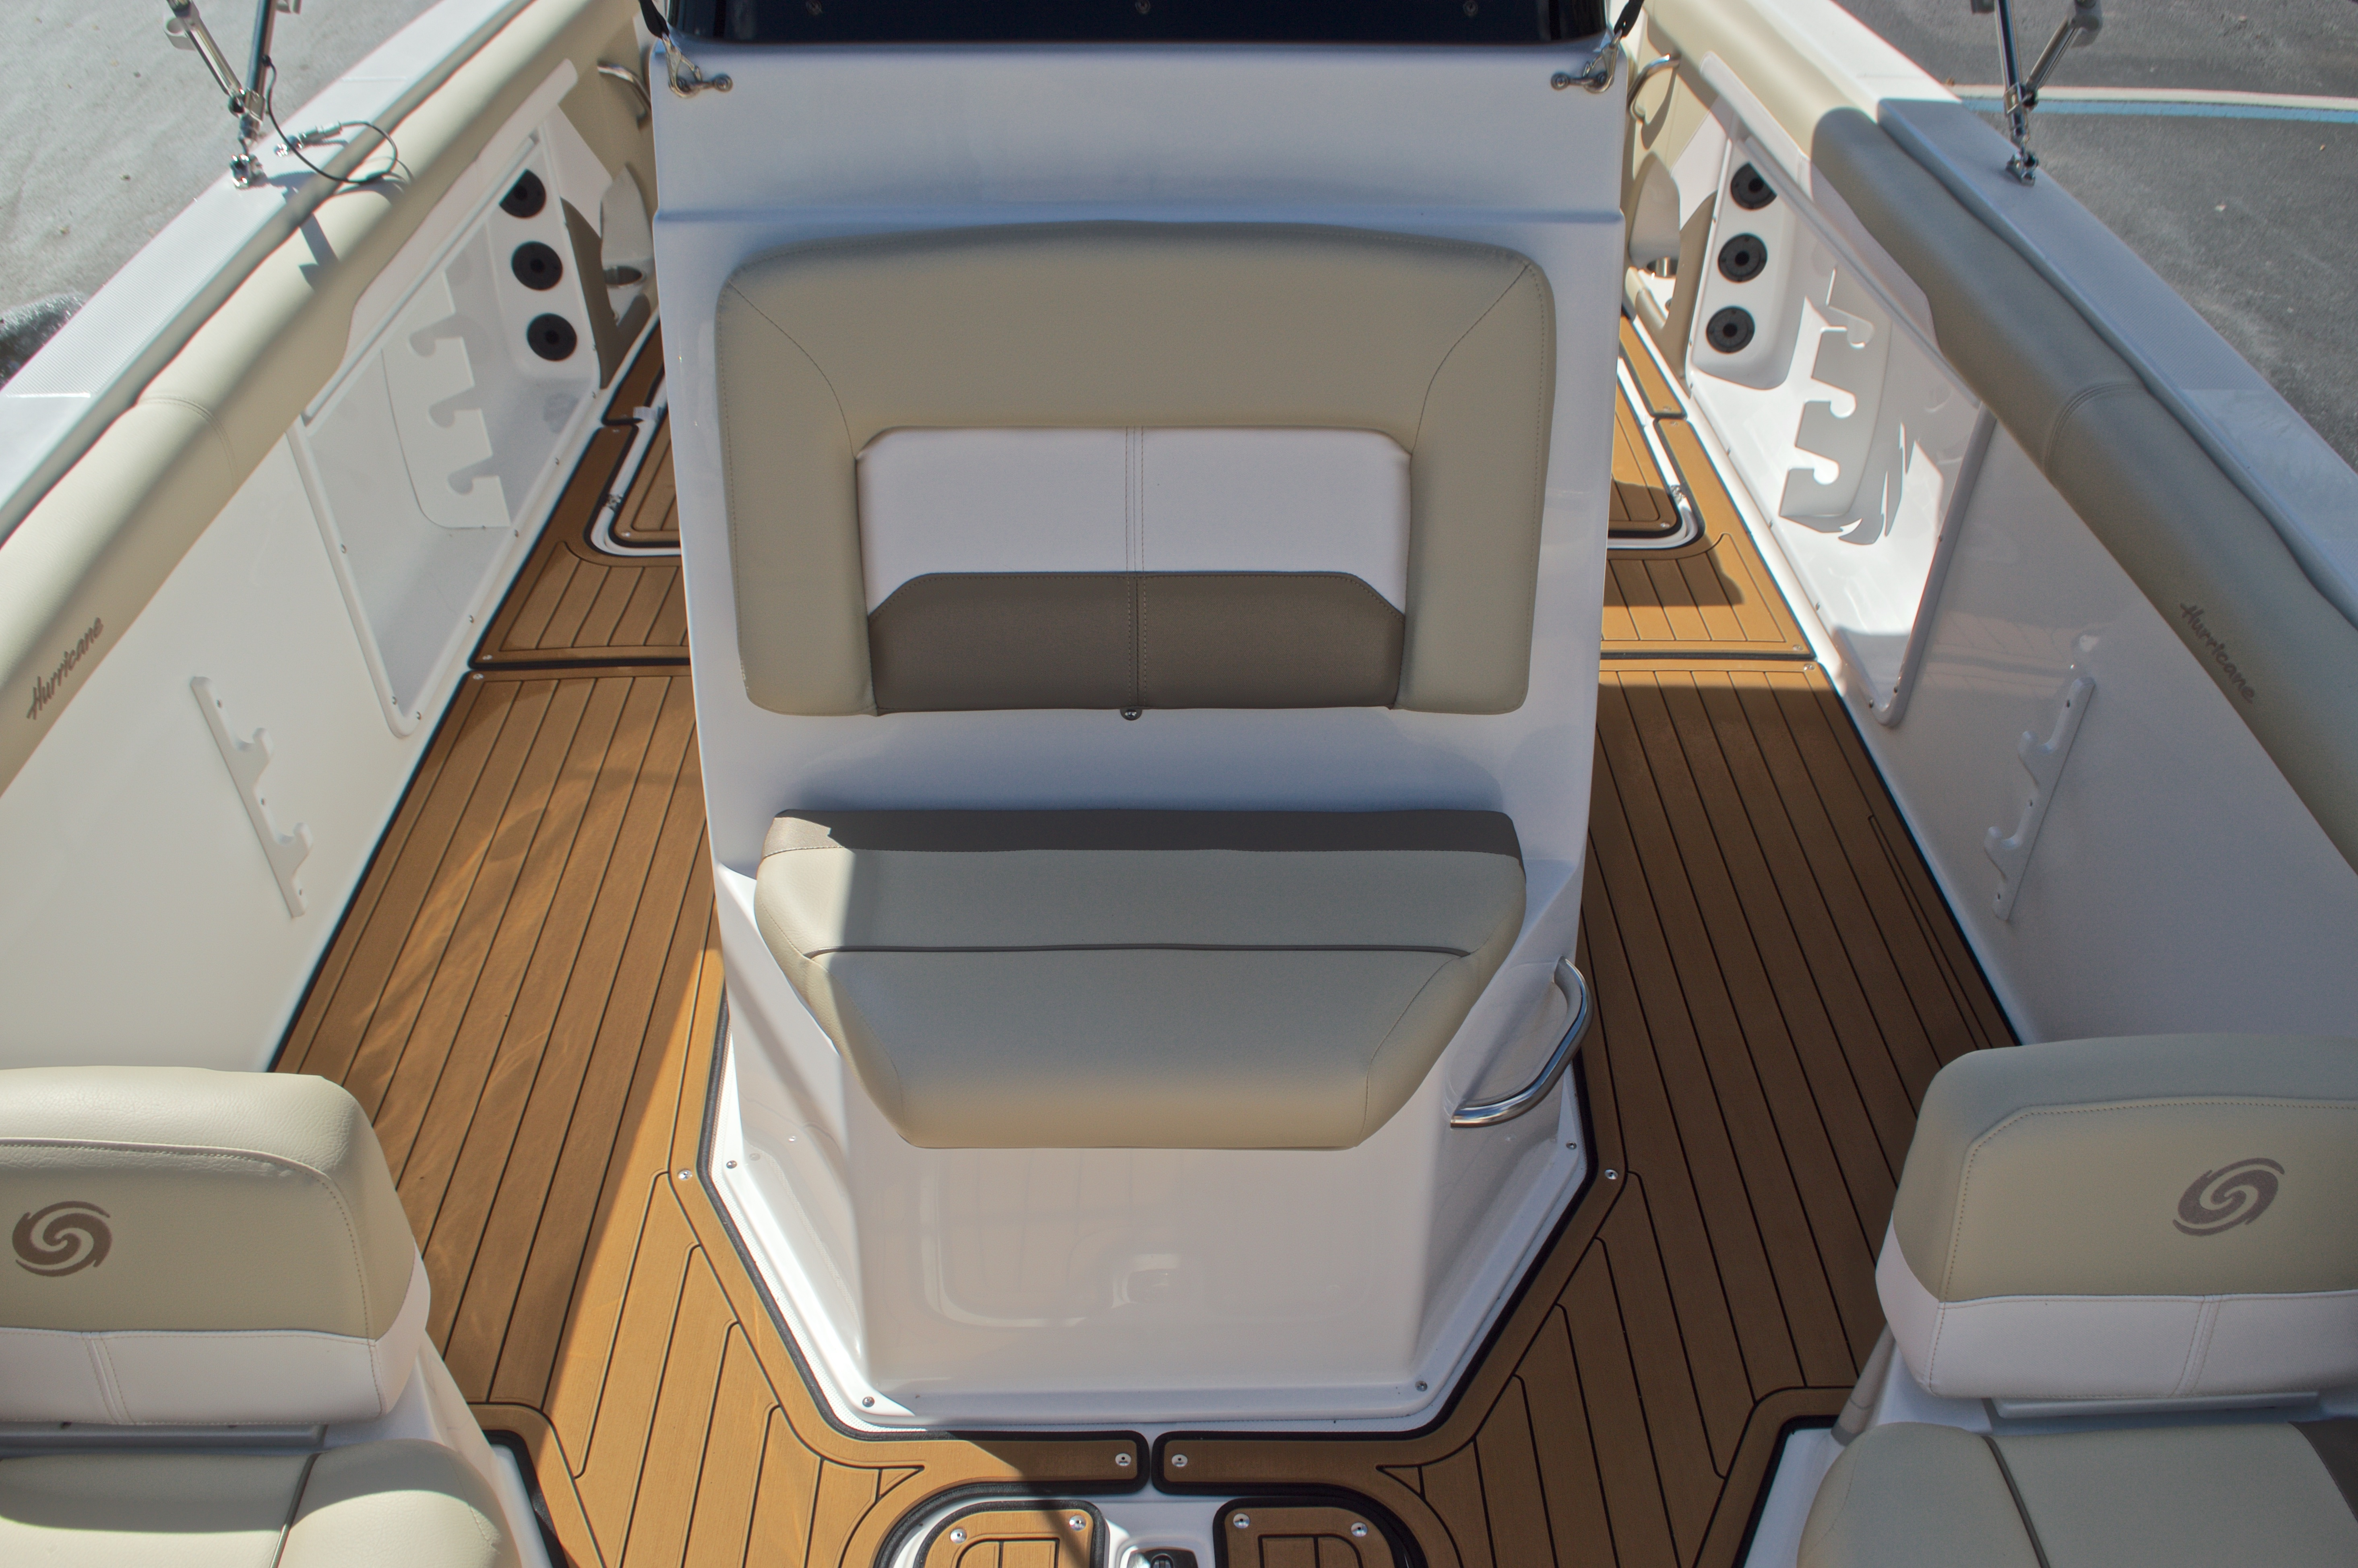 Thumbnail 39 for New 2017 Hurricane CC21 Center Console boat for sale in Vero Beach, FL